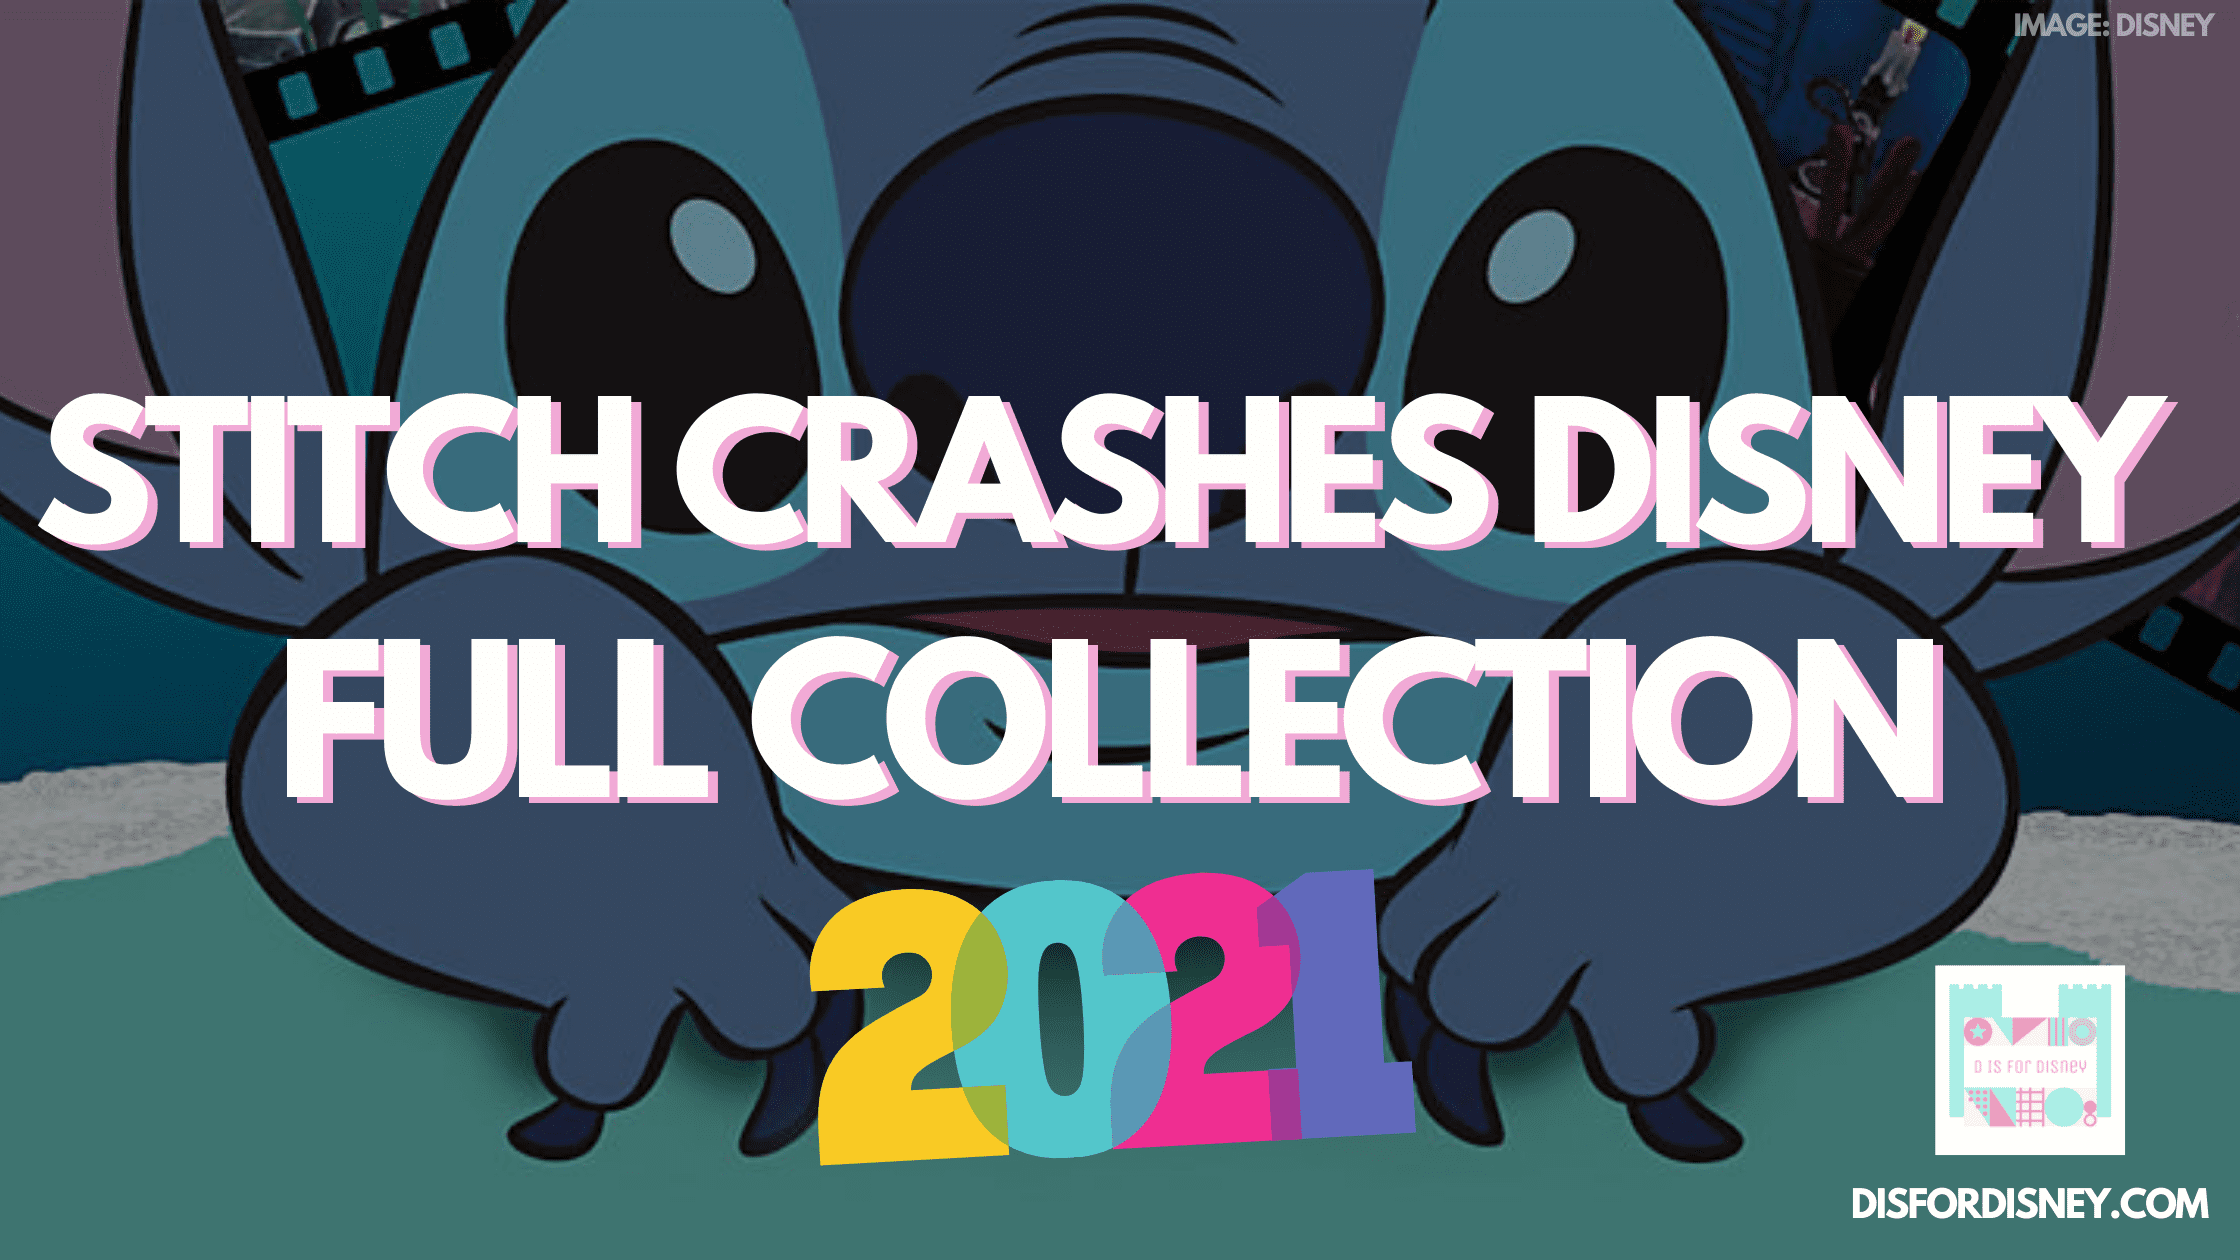 Stitch Crashes Disney Full Collection